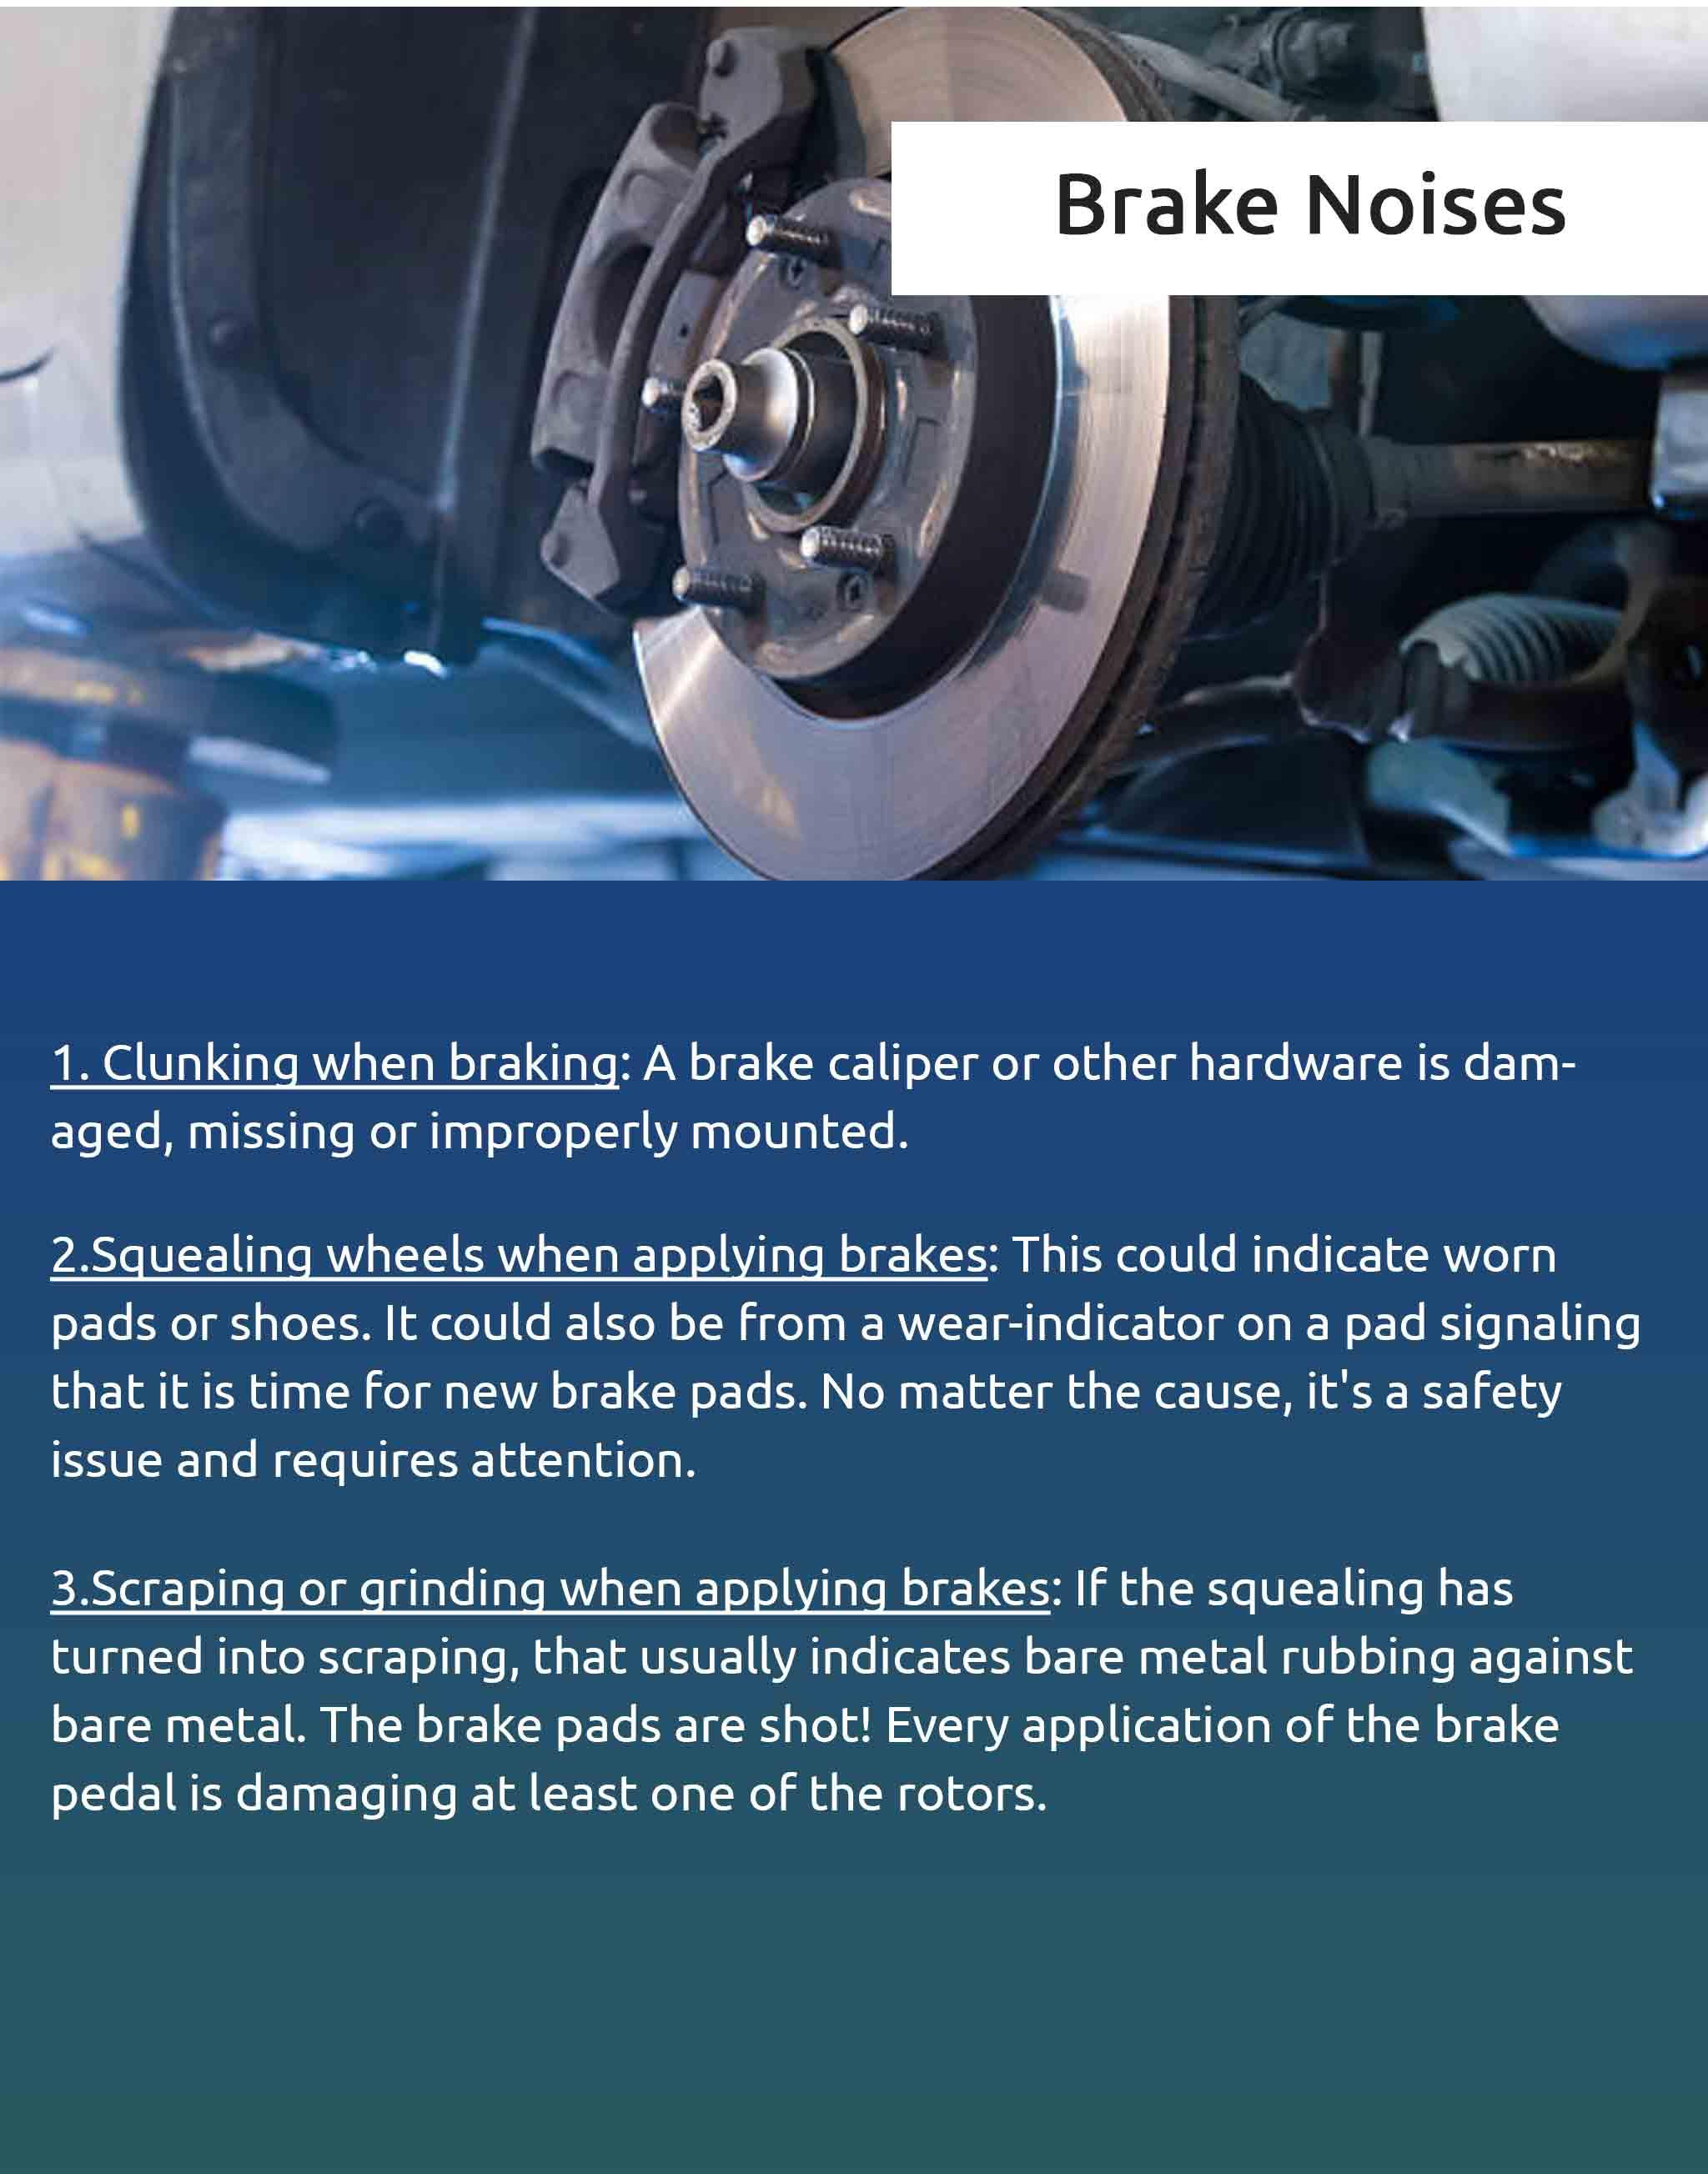 Partsavatar ca - Shop Premium Engine & Brake Parts